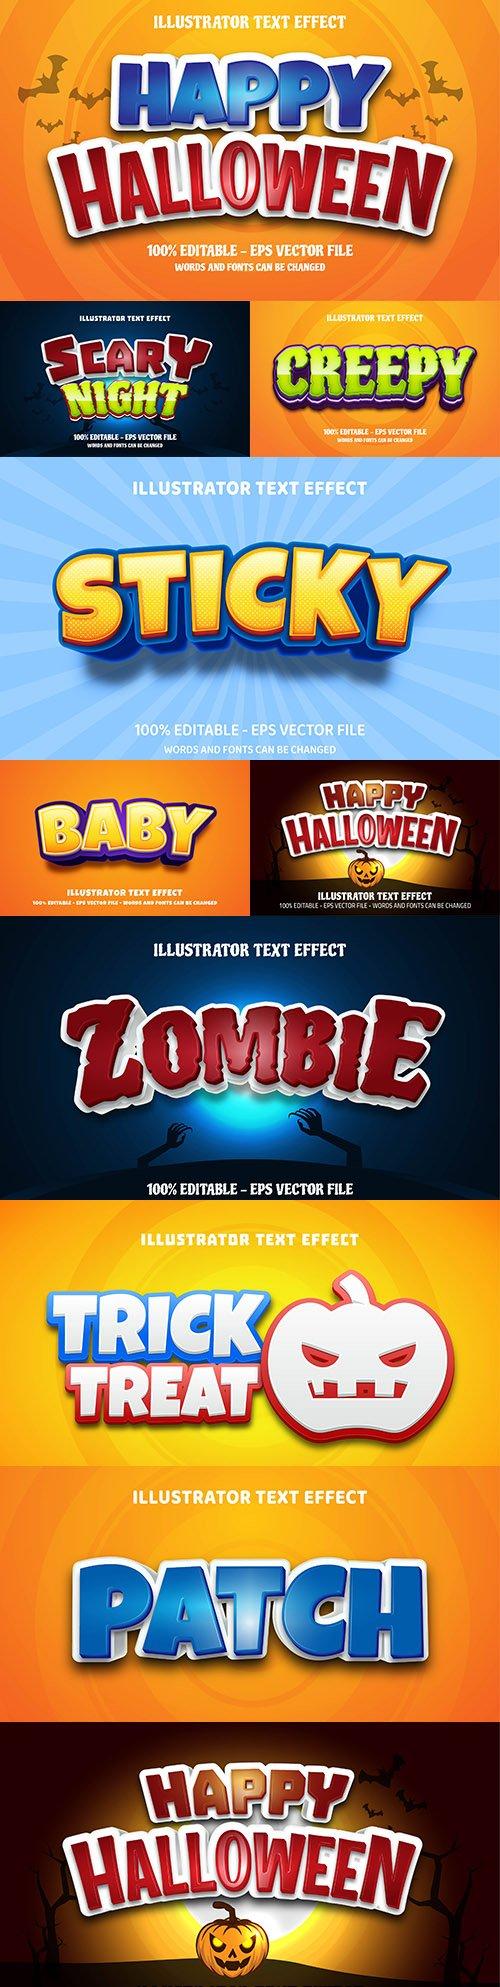 Editable font effect text collection illustration design 200